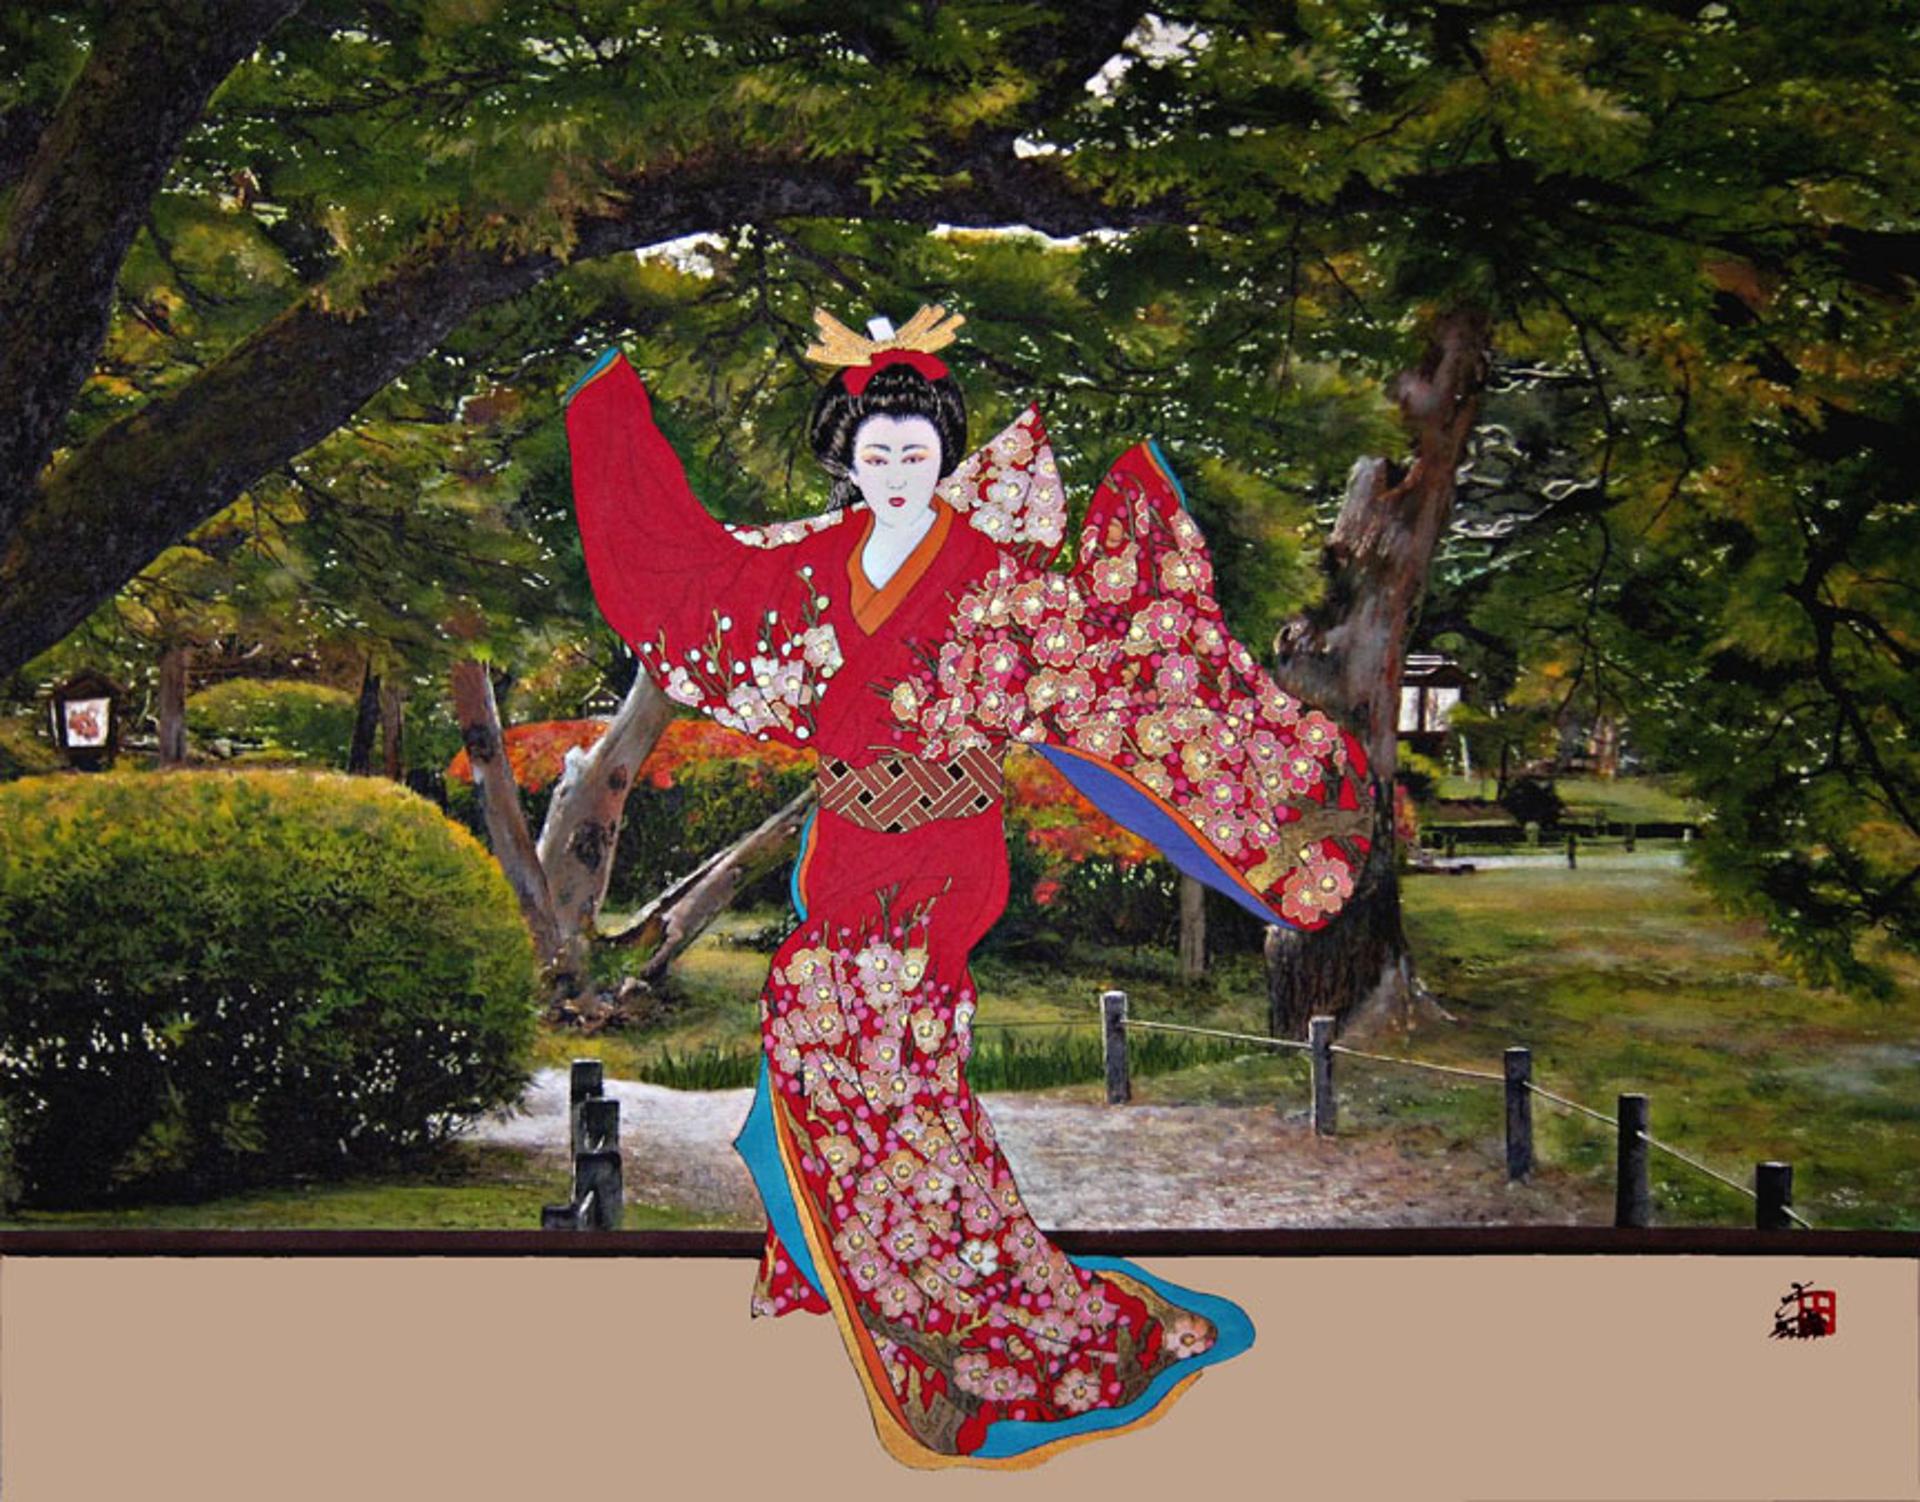 Sanzen In Gardens by Hisashi Otsuka